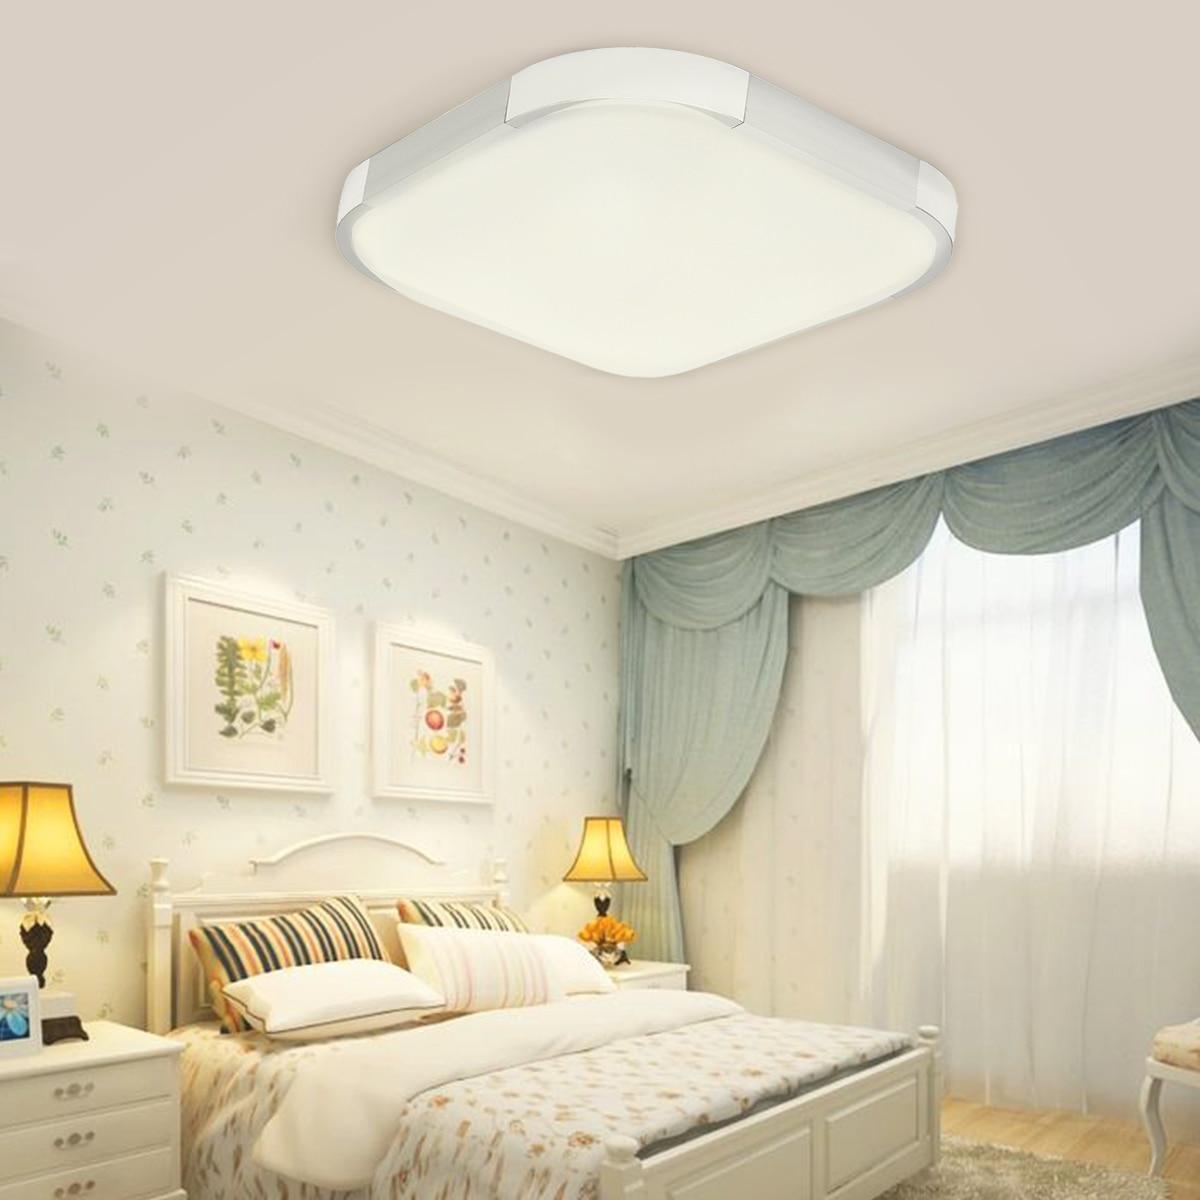 12/18/24W Modern Square LED Ceiling Lights Dimmable Led Ceiling Lamp Flush Mount Lighting Decor for Living Room Kitchen Hallways